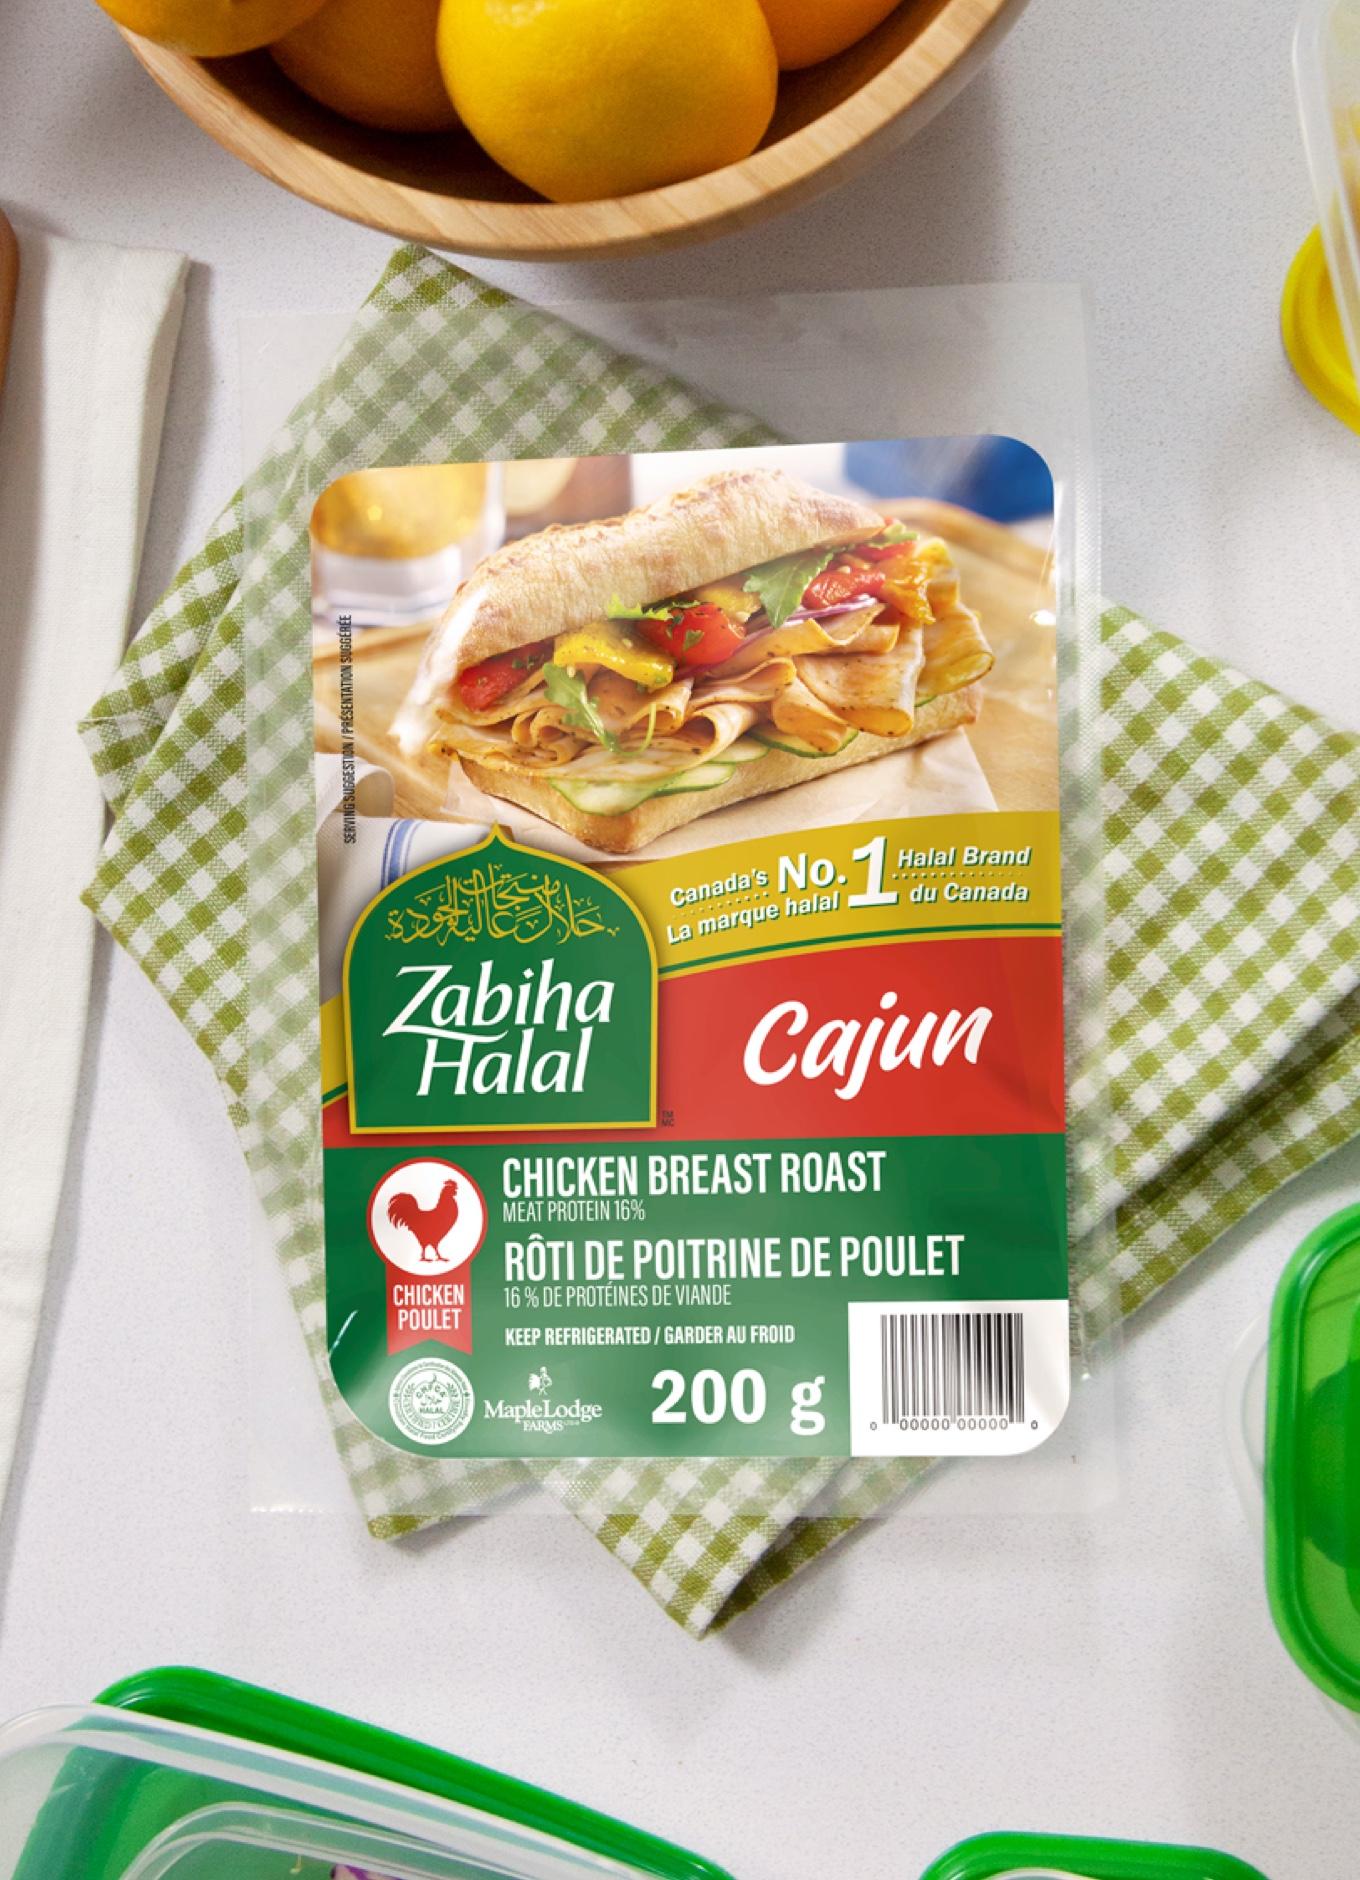 A package of Zabiha Halal Cajun Deli slices on a set table